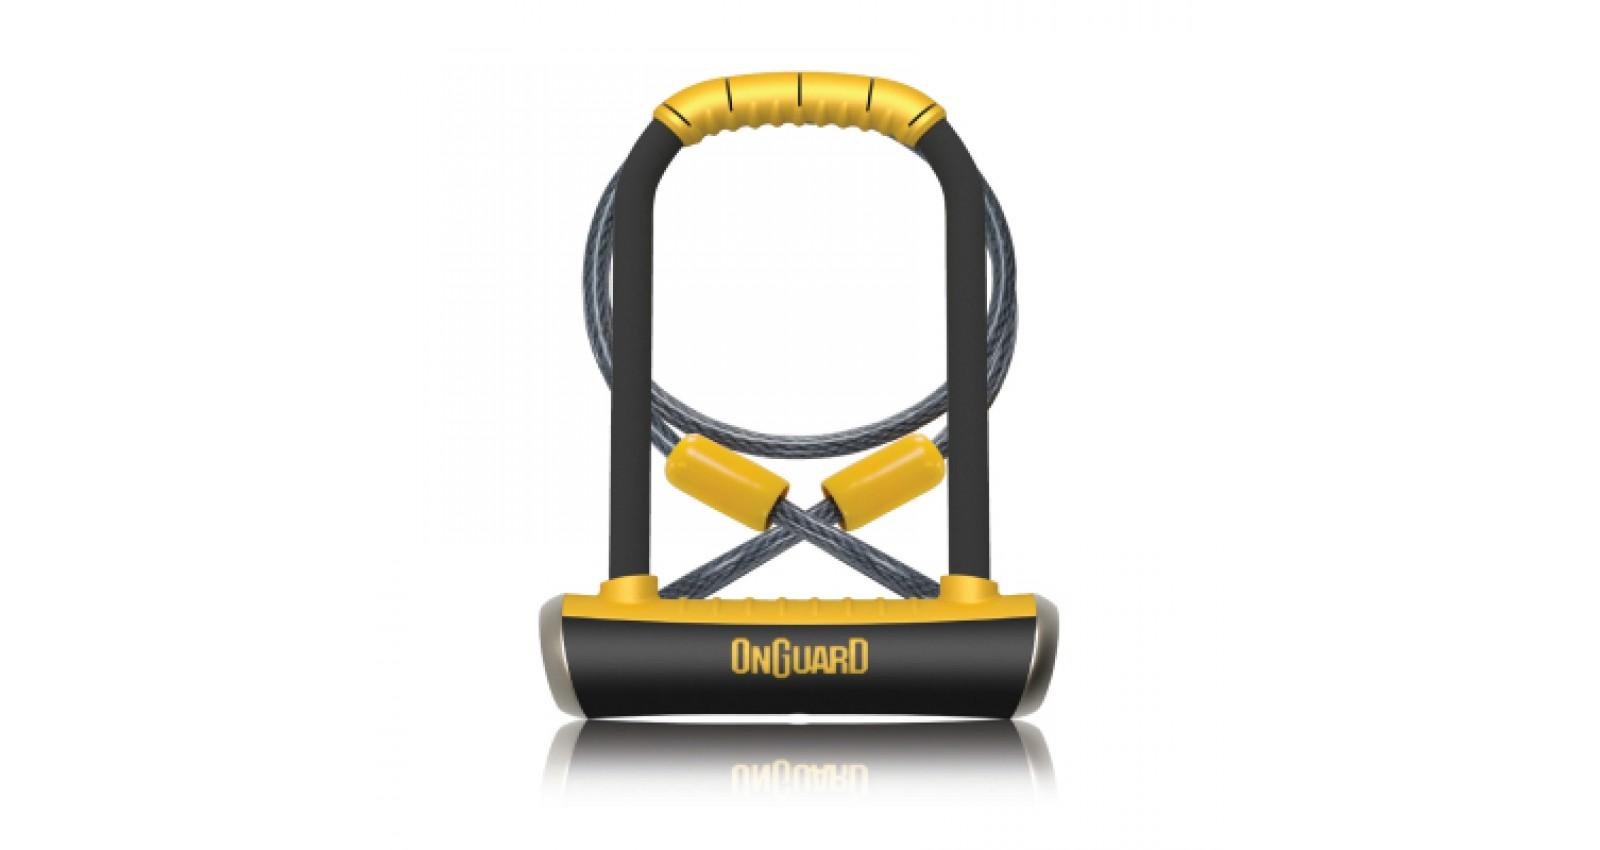 Велозамок ONGUARD PITBULL DT 14x115x230 мм + трос 10x1200 мм - № Фото 1 - № Фото 2 - № Фото 3